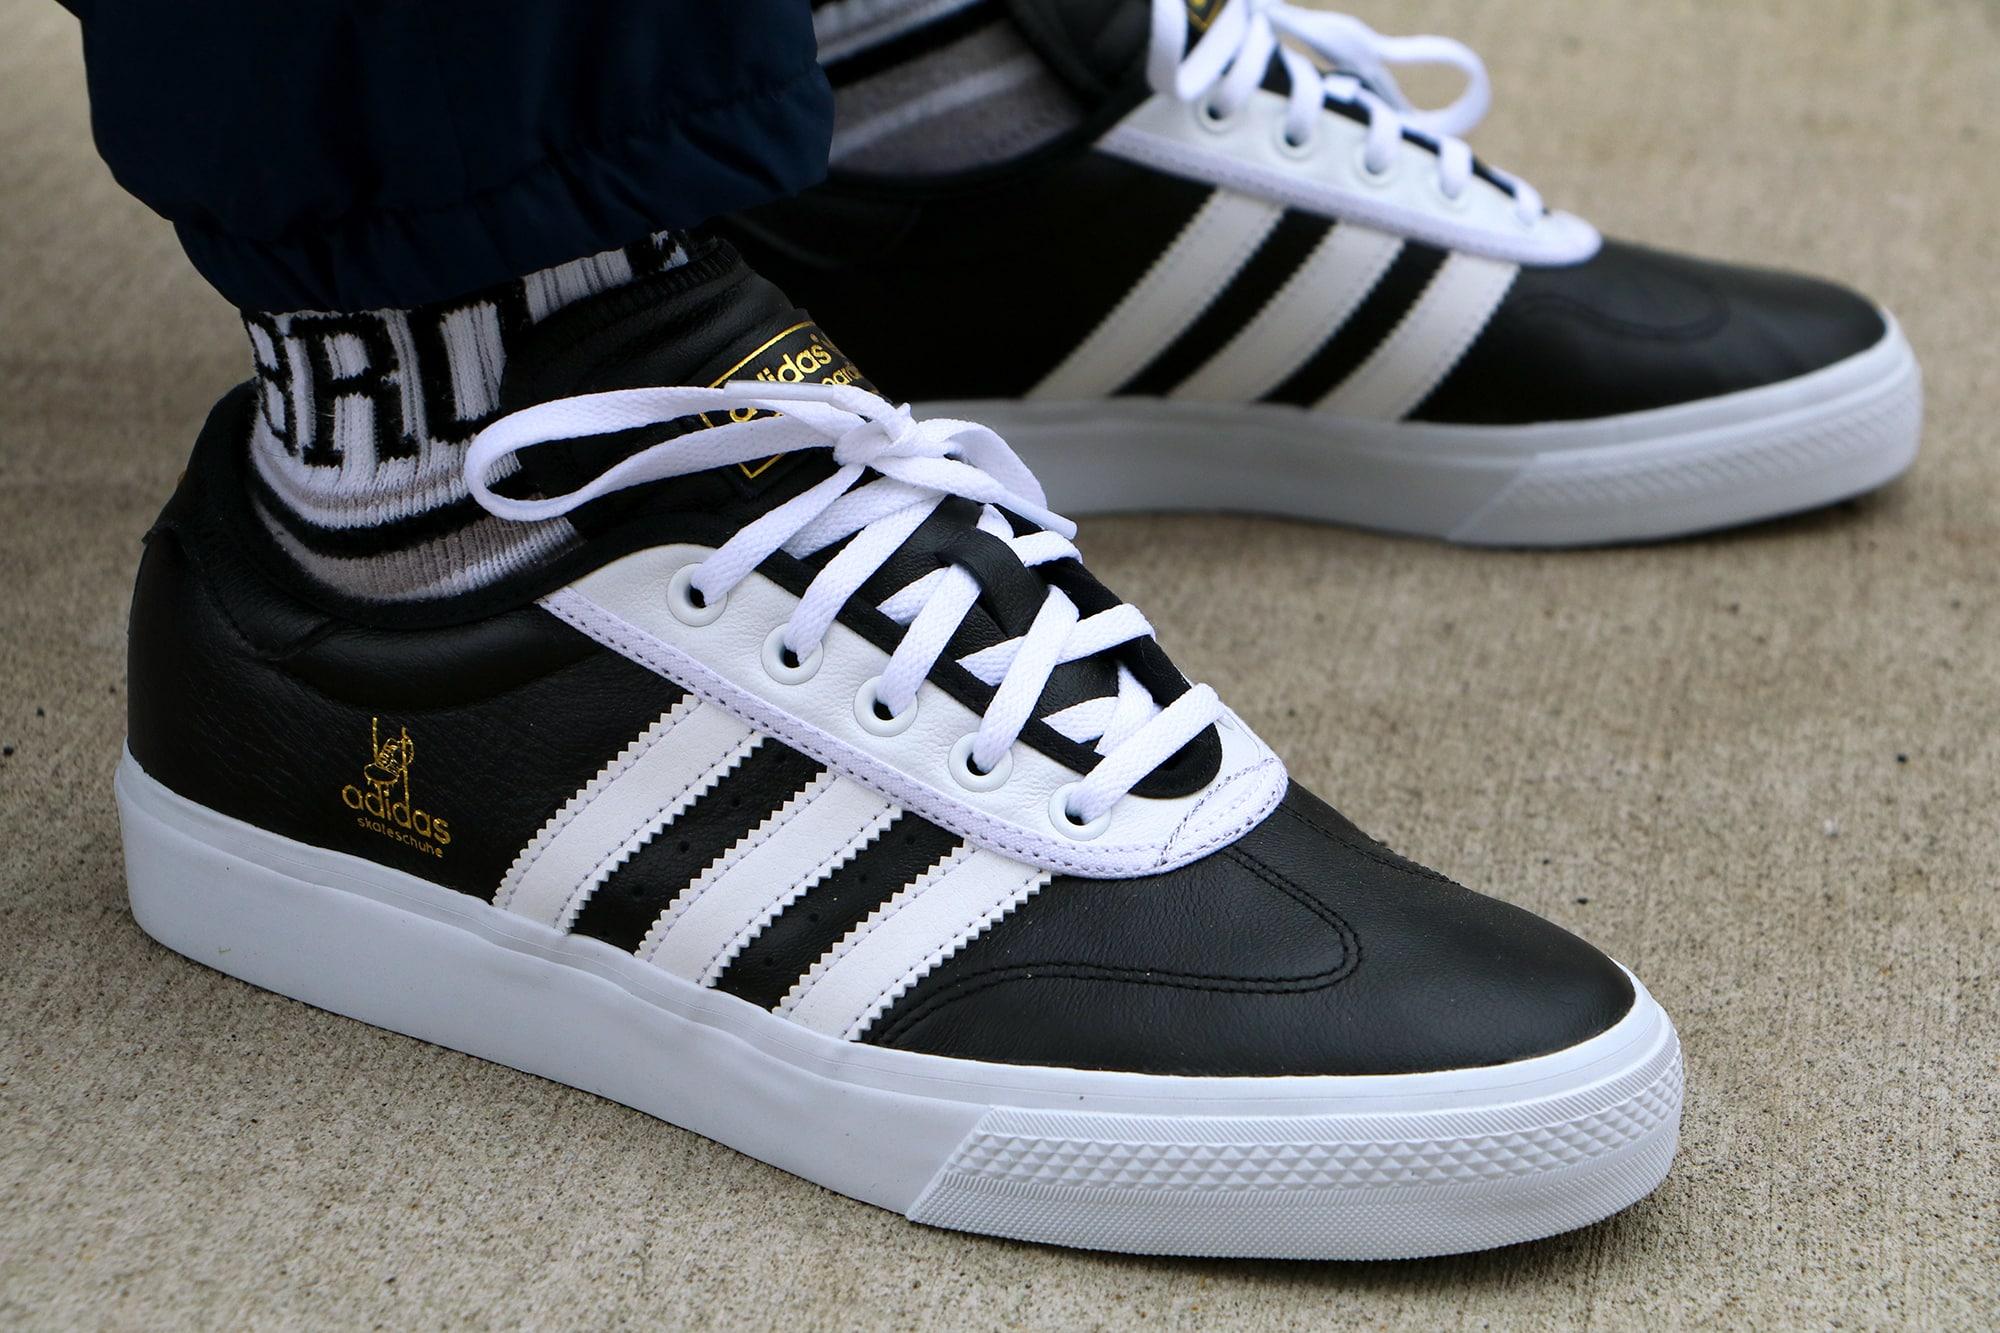 Adidas Adi Ease Premiere Universal Skate Shoes